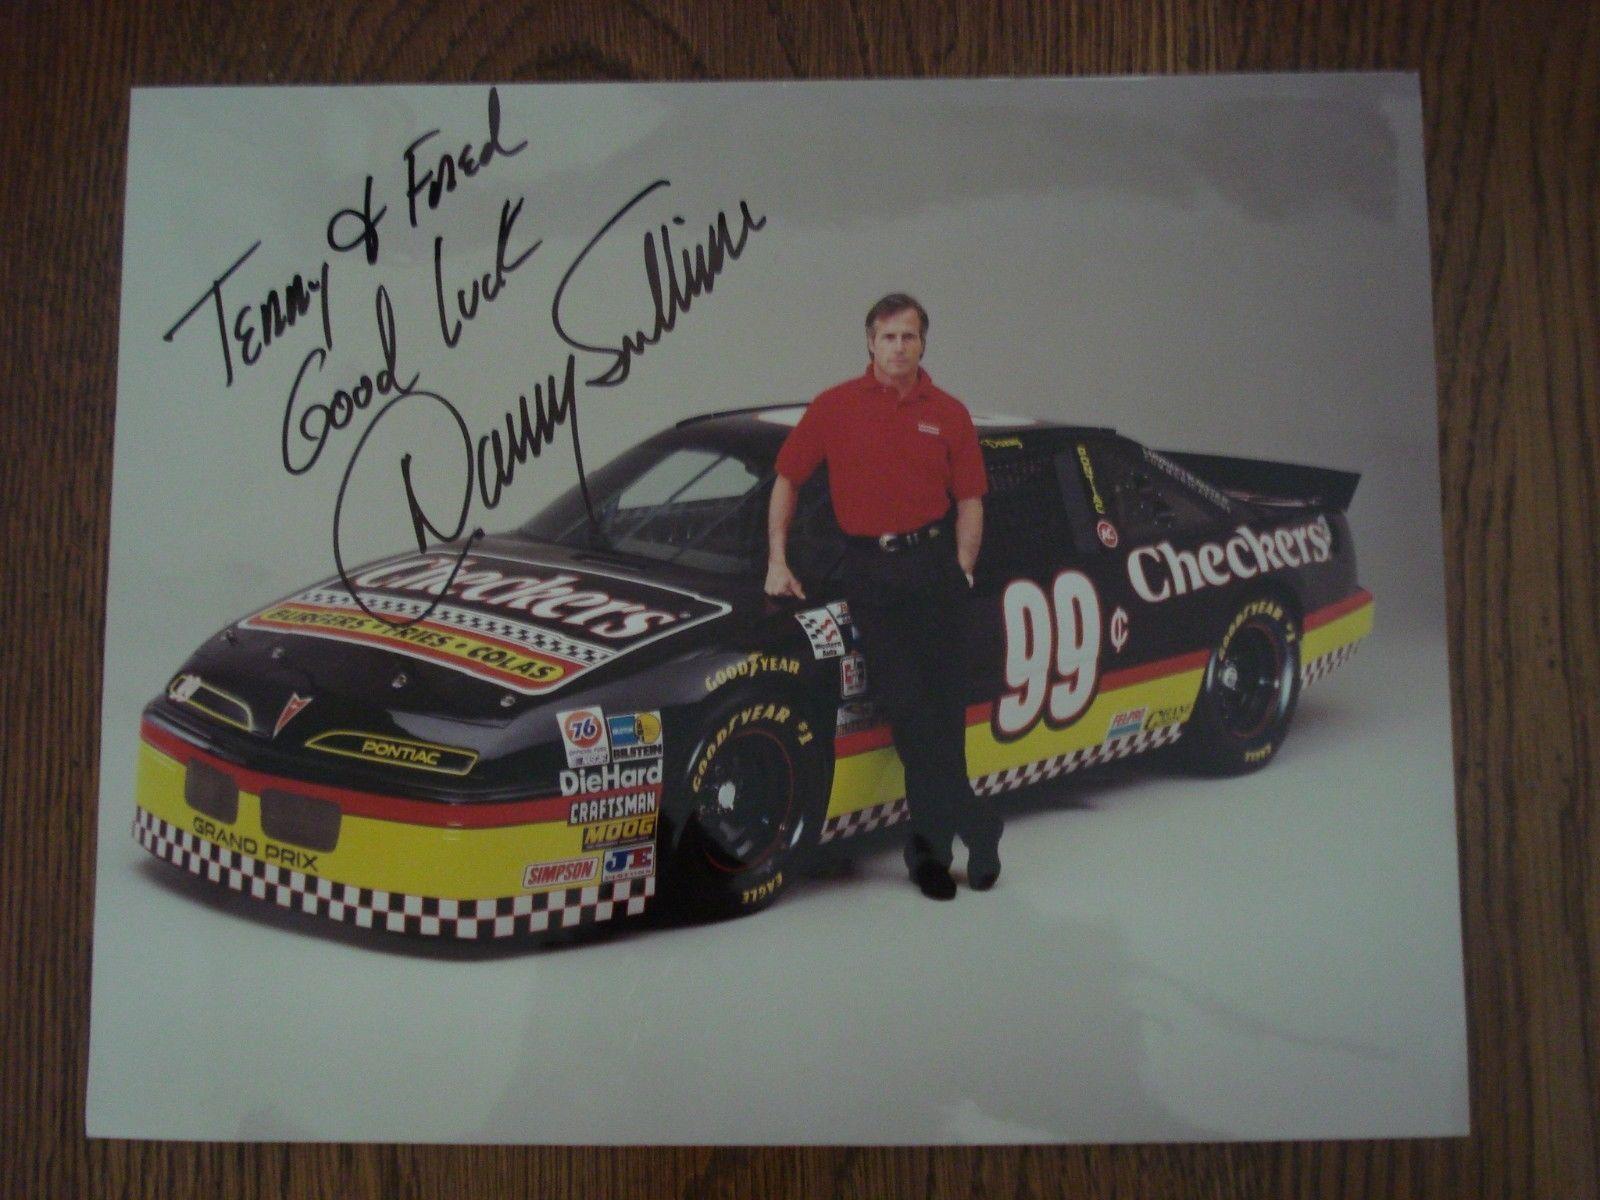 Paint schemes coca cola 600 free download image about all car type - Autographed Danny Sullivan Nascar Race Driver Checkers Photo 8x10